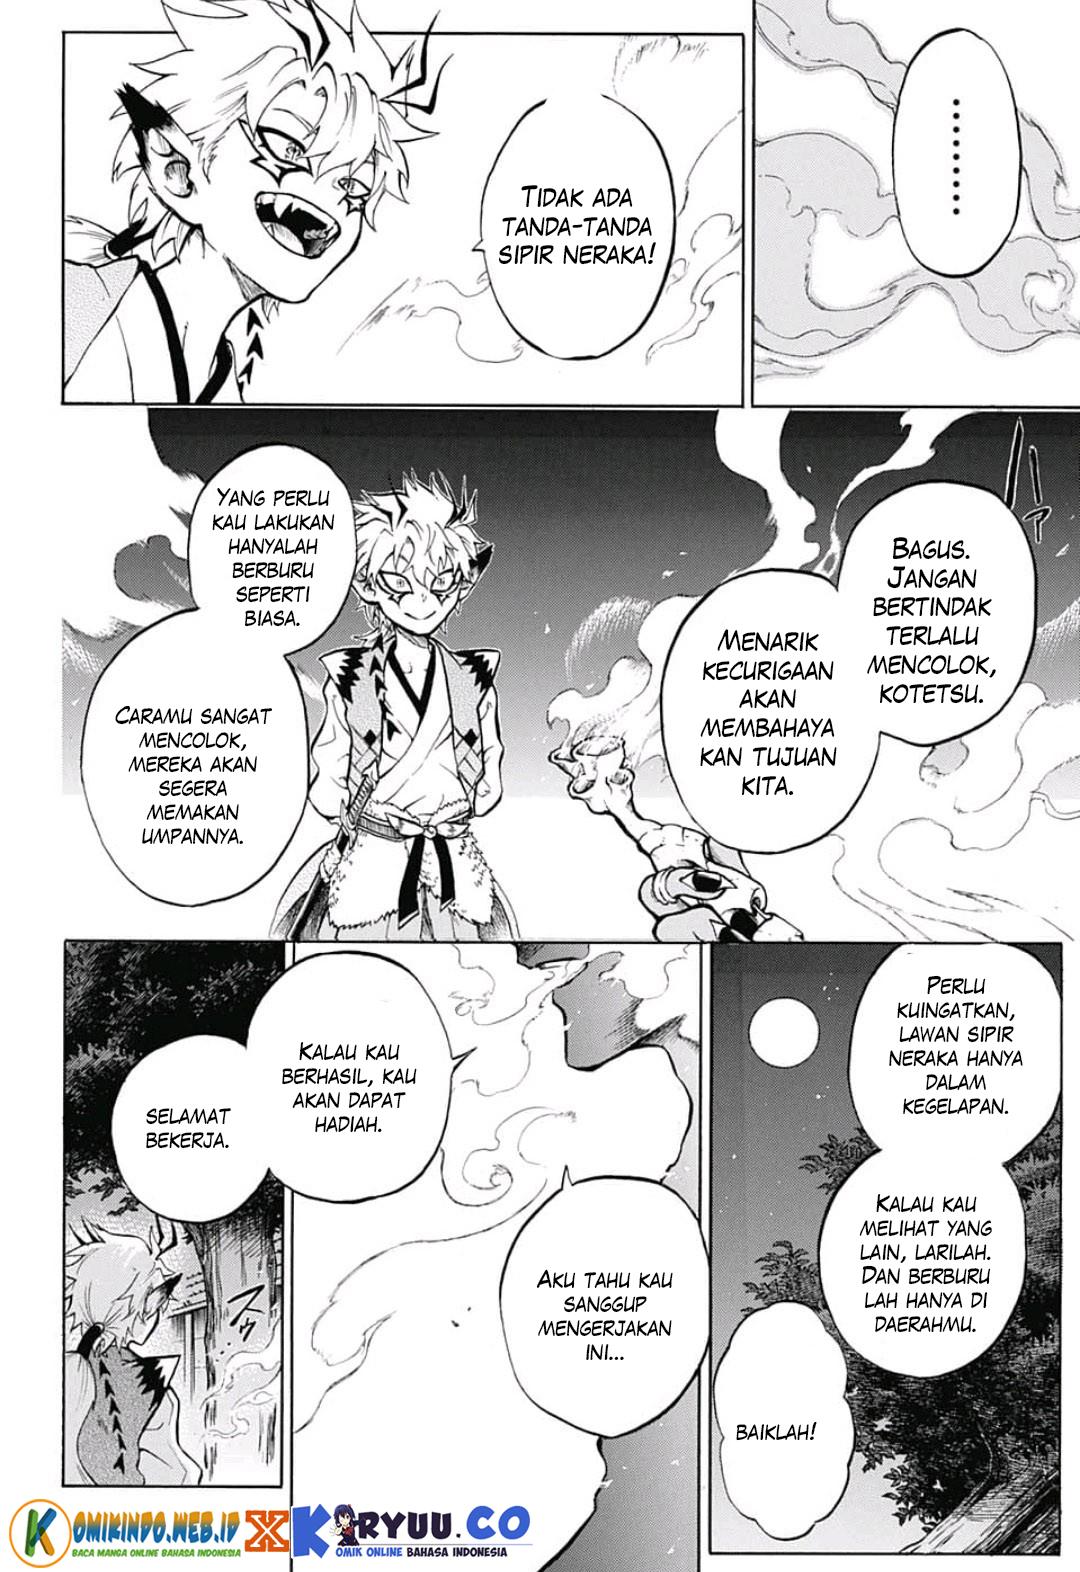 Gokutei Higuma Chapter 7